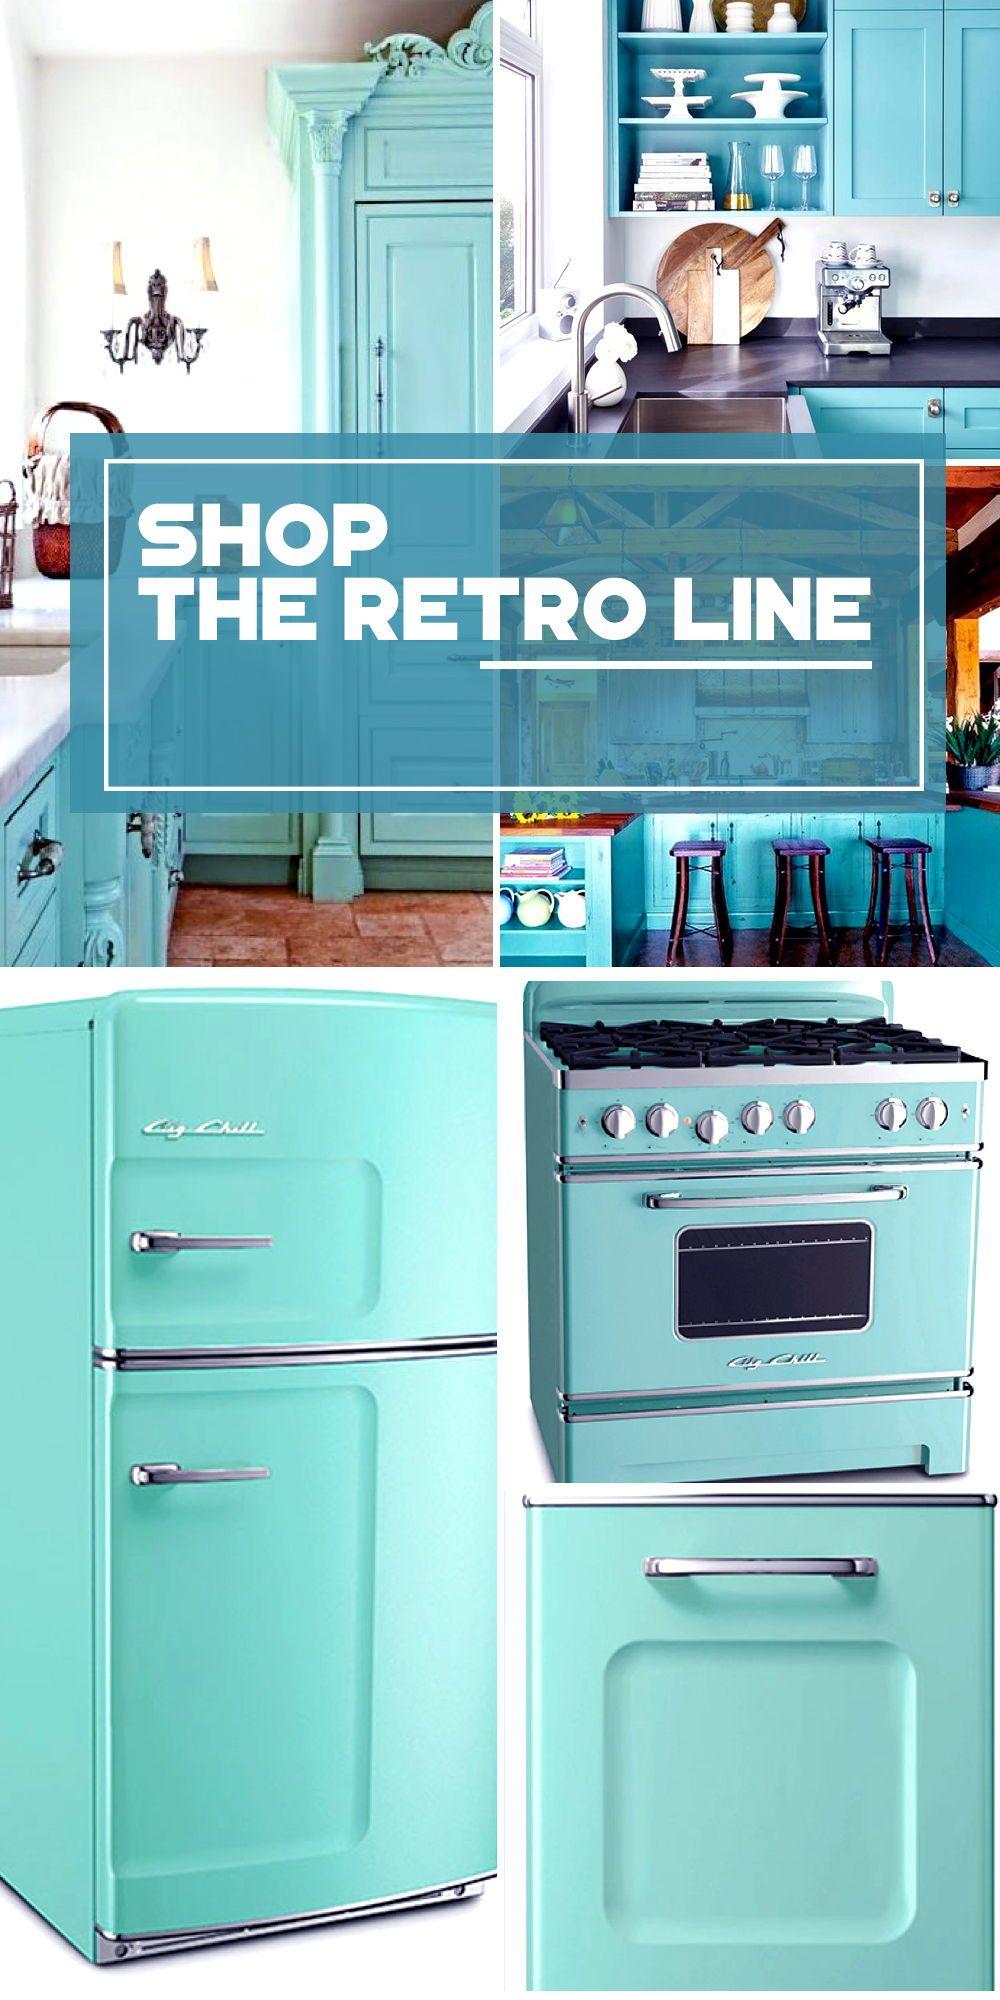 I Love Big Chill S Retro Fridges A Bit Funkier And Cooler Than Smeg Fridge Smeg Retro K Retro Kitchen Appliances Retro Appliances Kitchen Design Decor